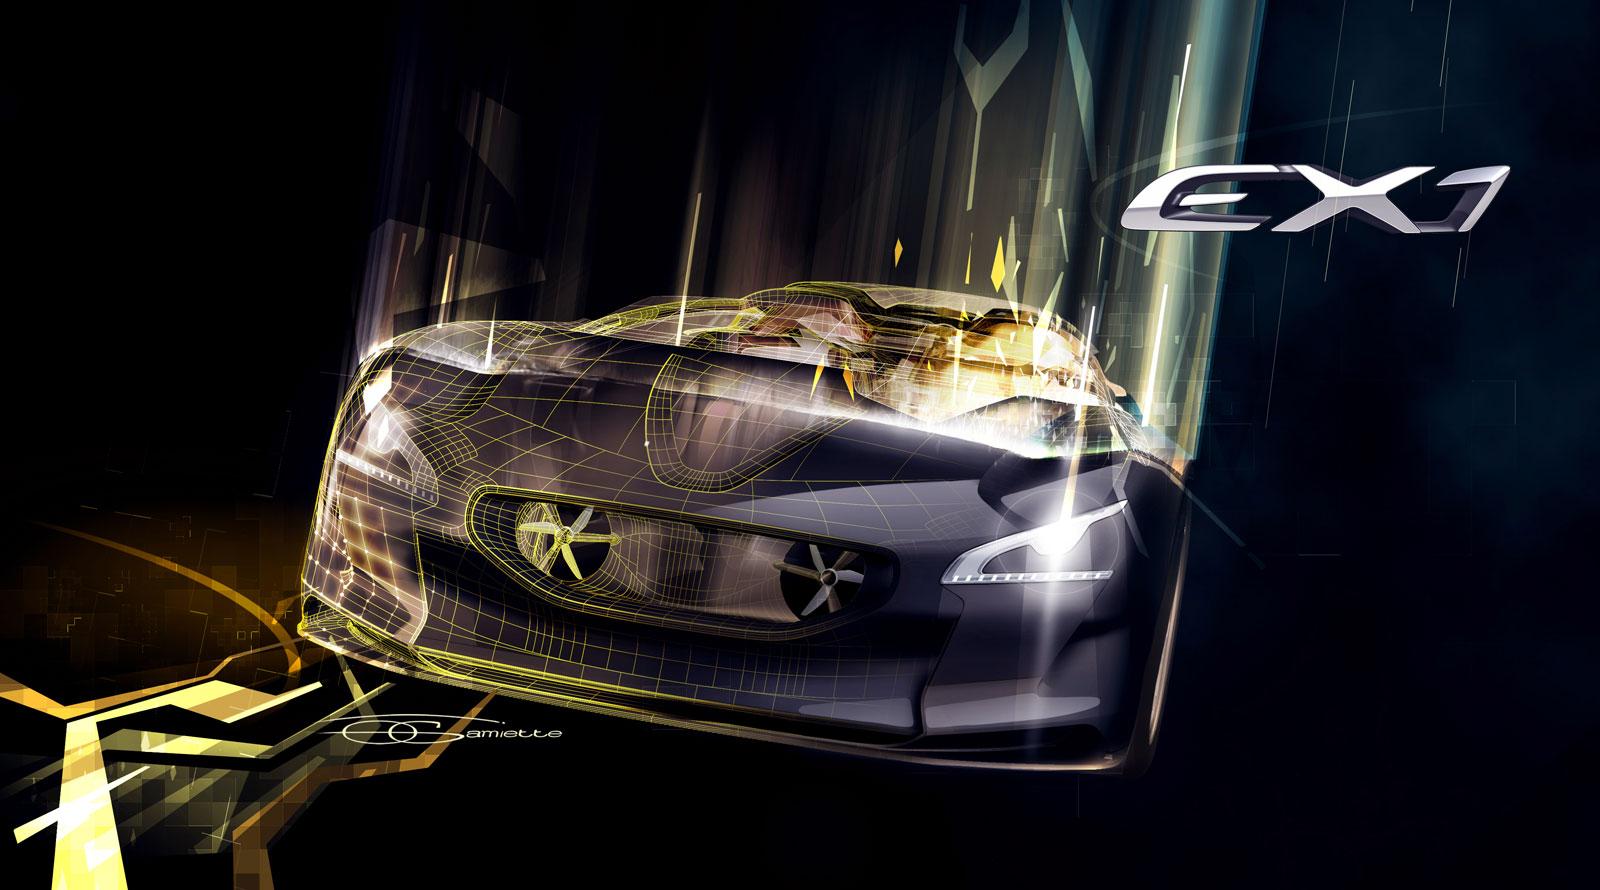 Peugeot EX1 Concept Design Rendering By Olivier Gamiette